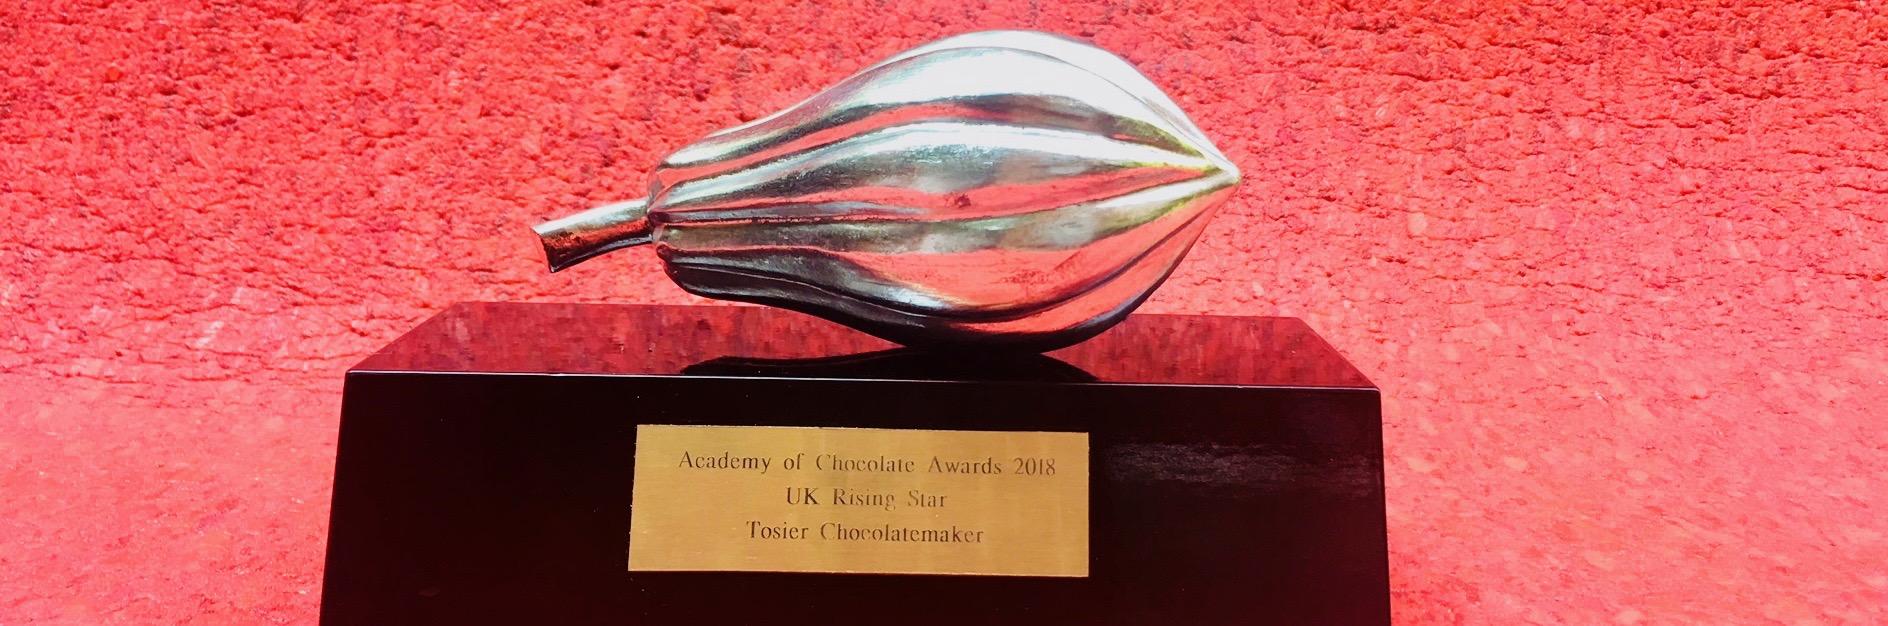 Academy of Chocolate UK Rising star Award 2018